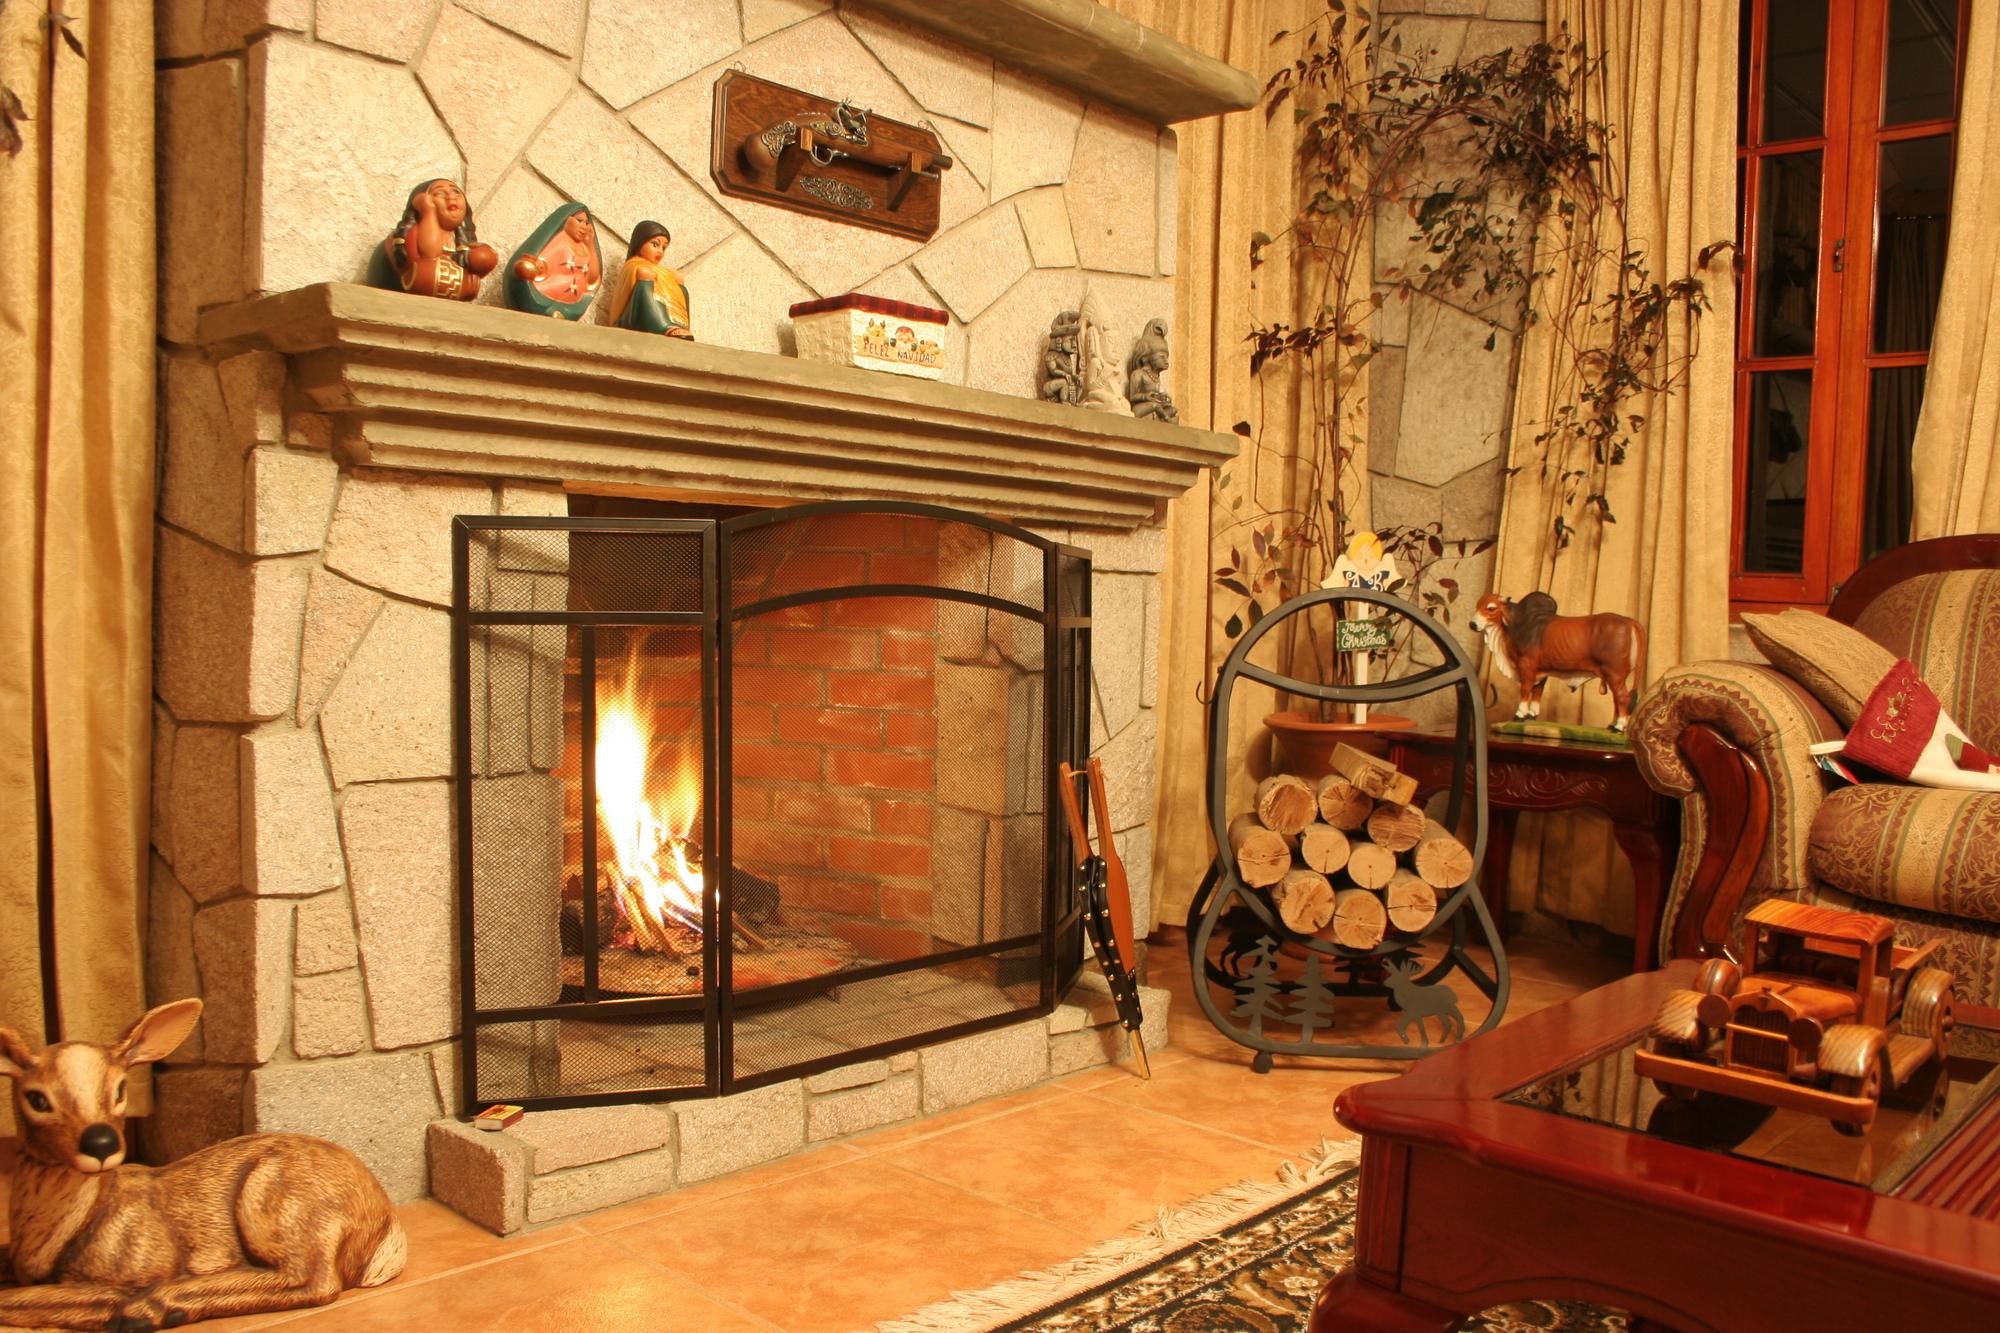 Deerfield Fireplace Tile Installation